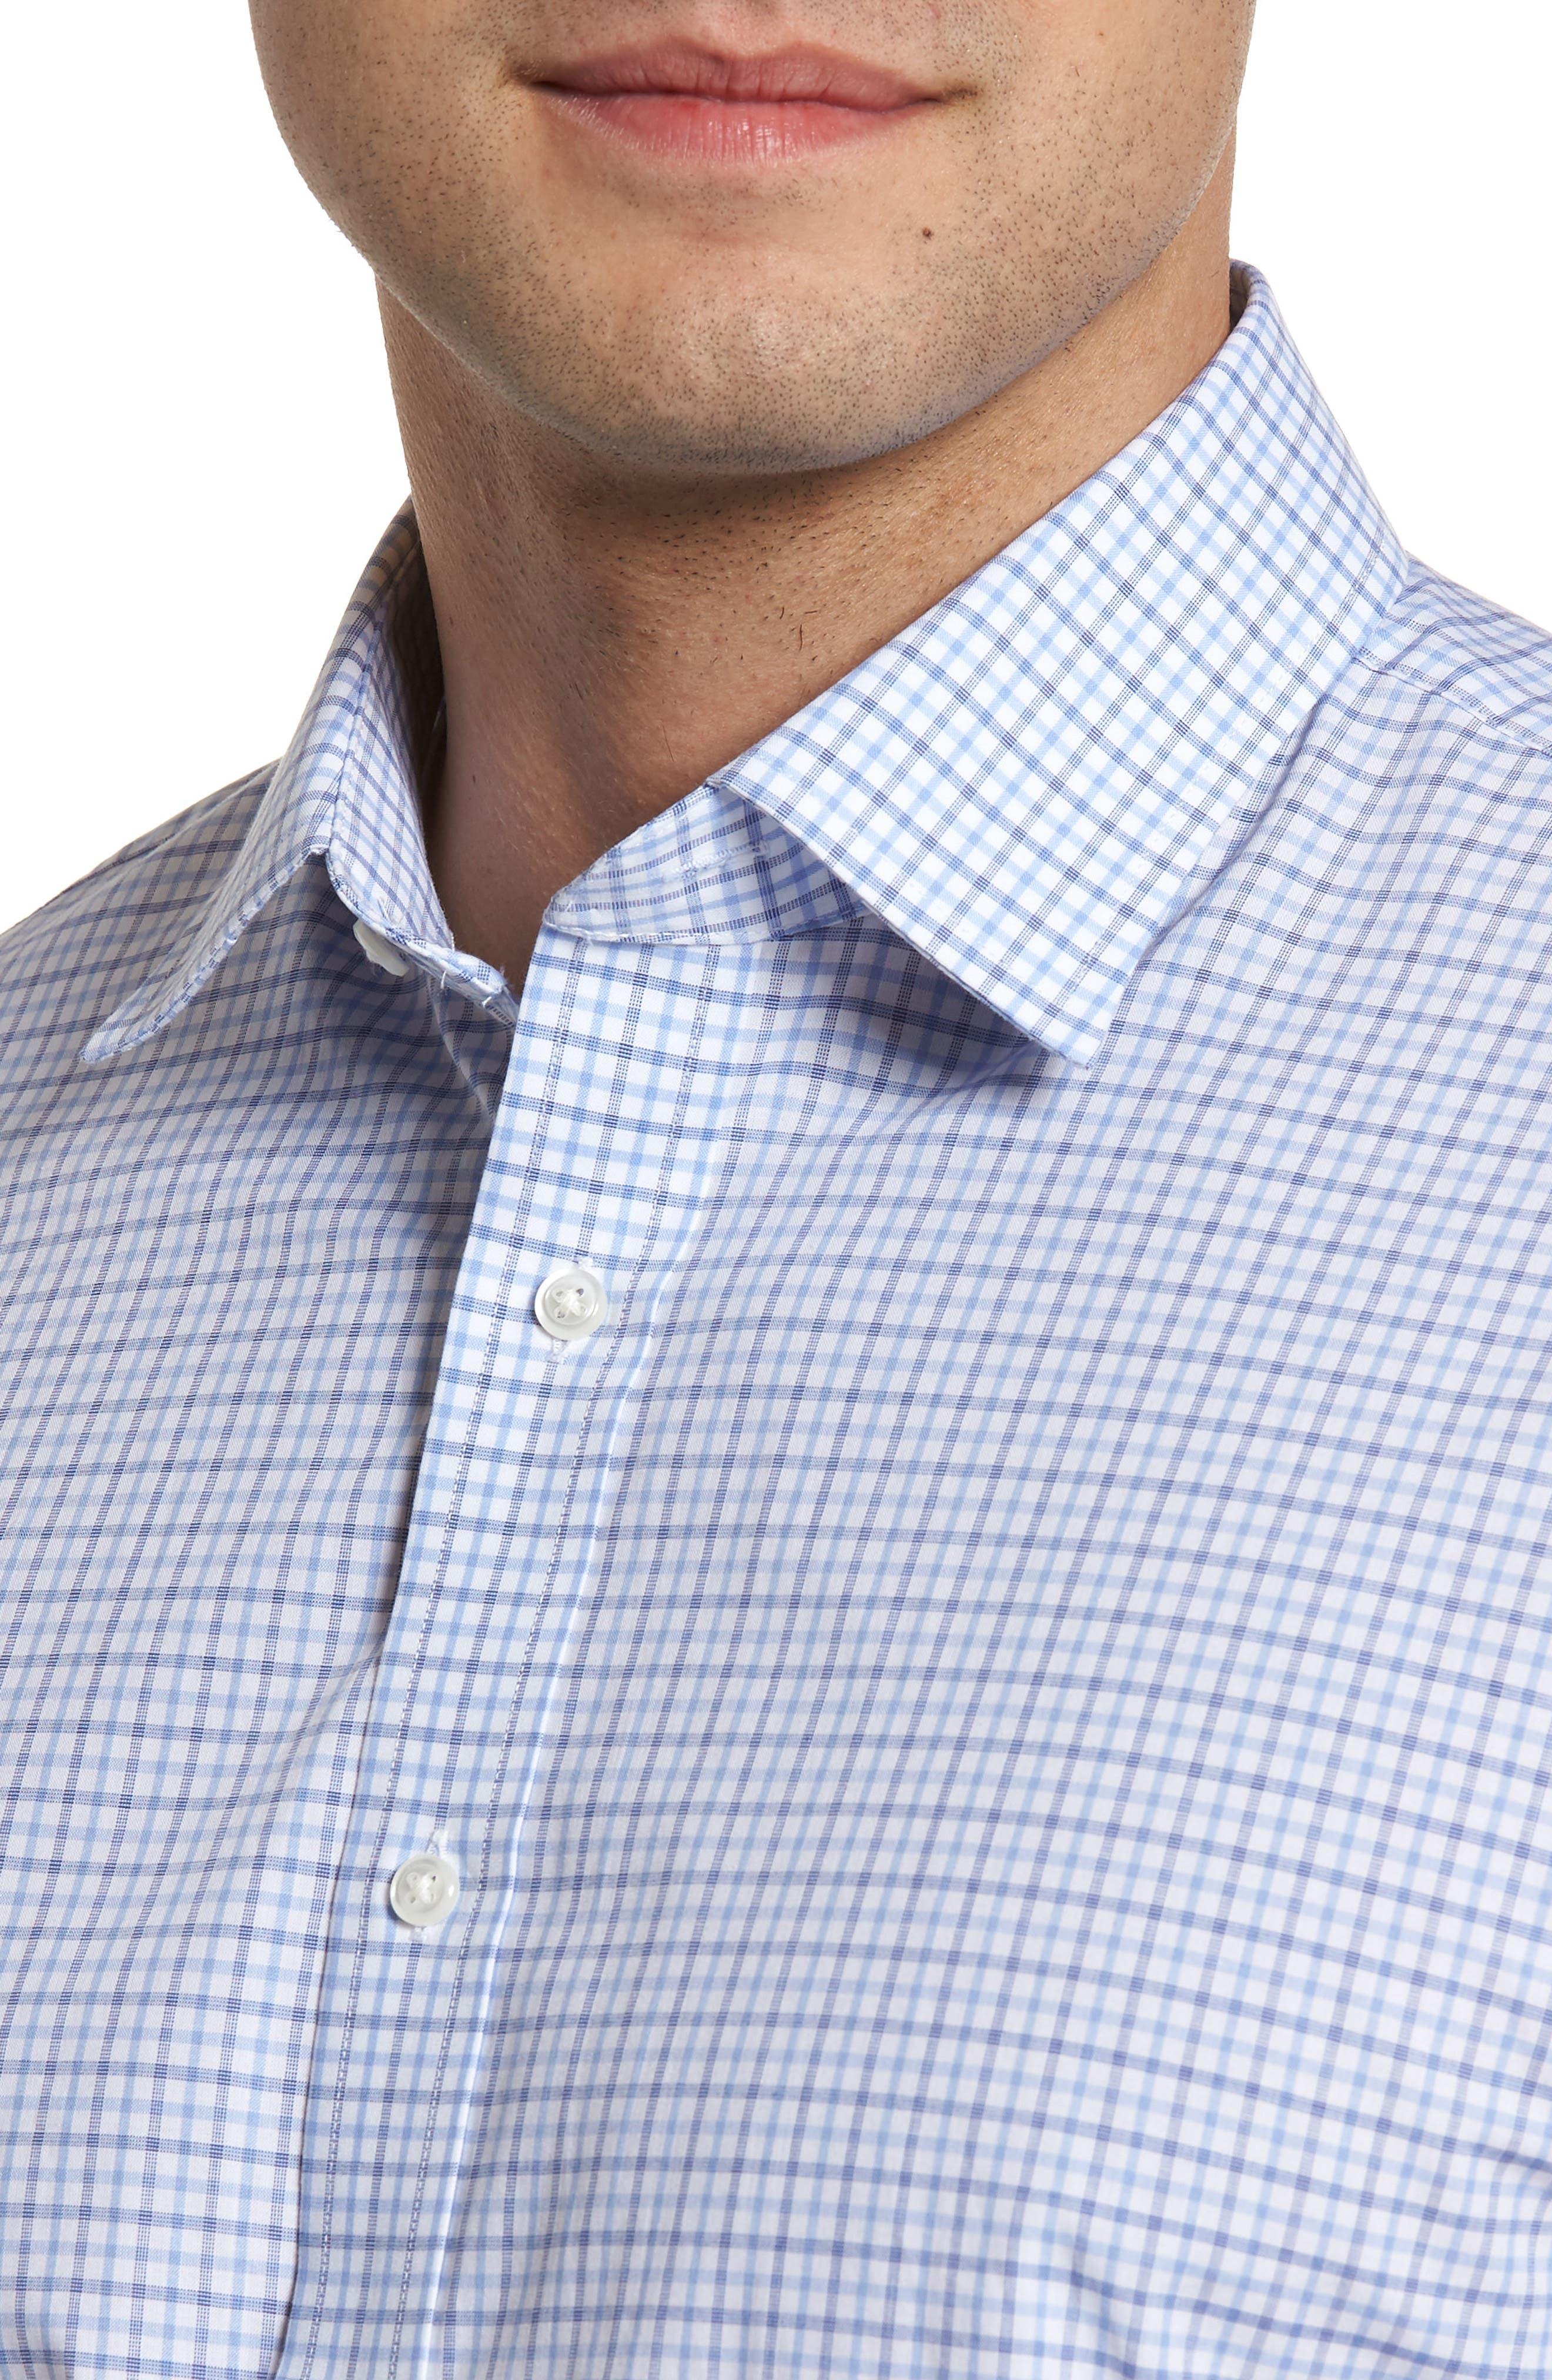 Classic Fit Check Dress Shirt,                             Alternate thumbnail 2, color,                             Blue Marine